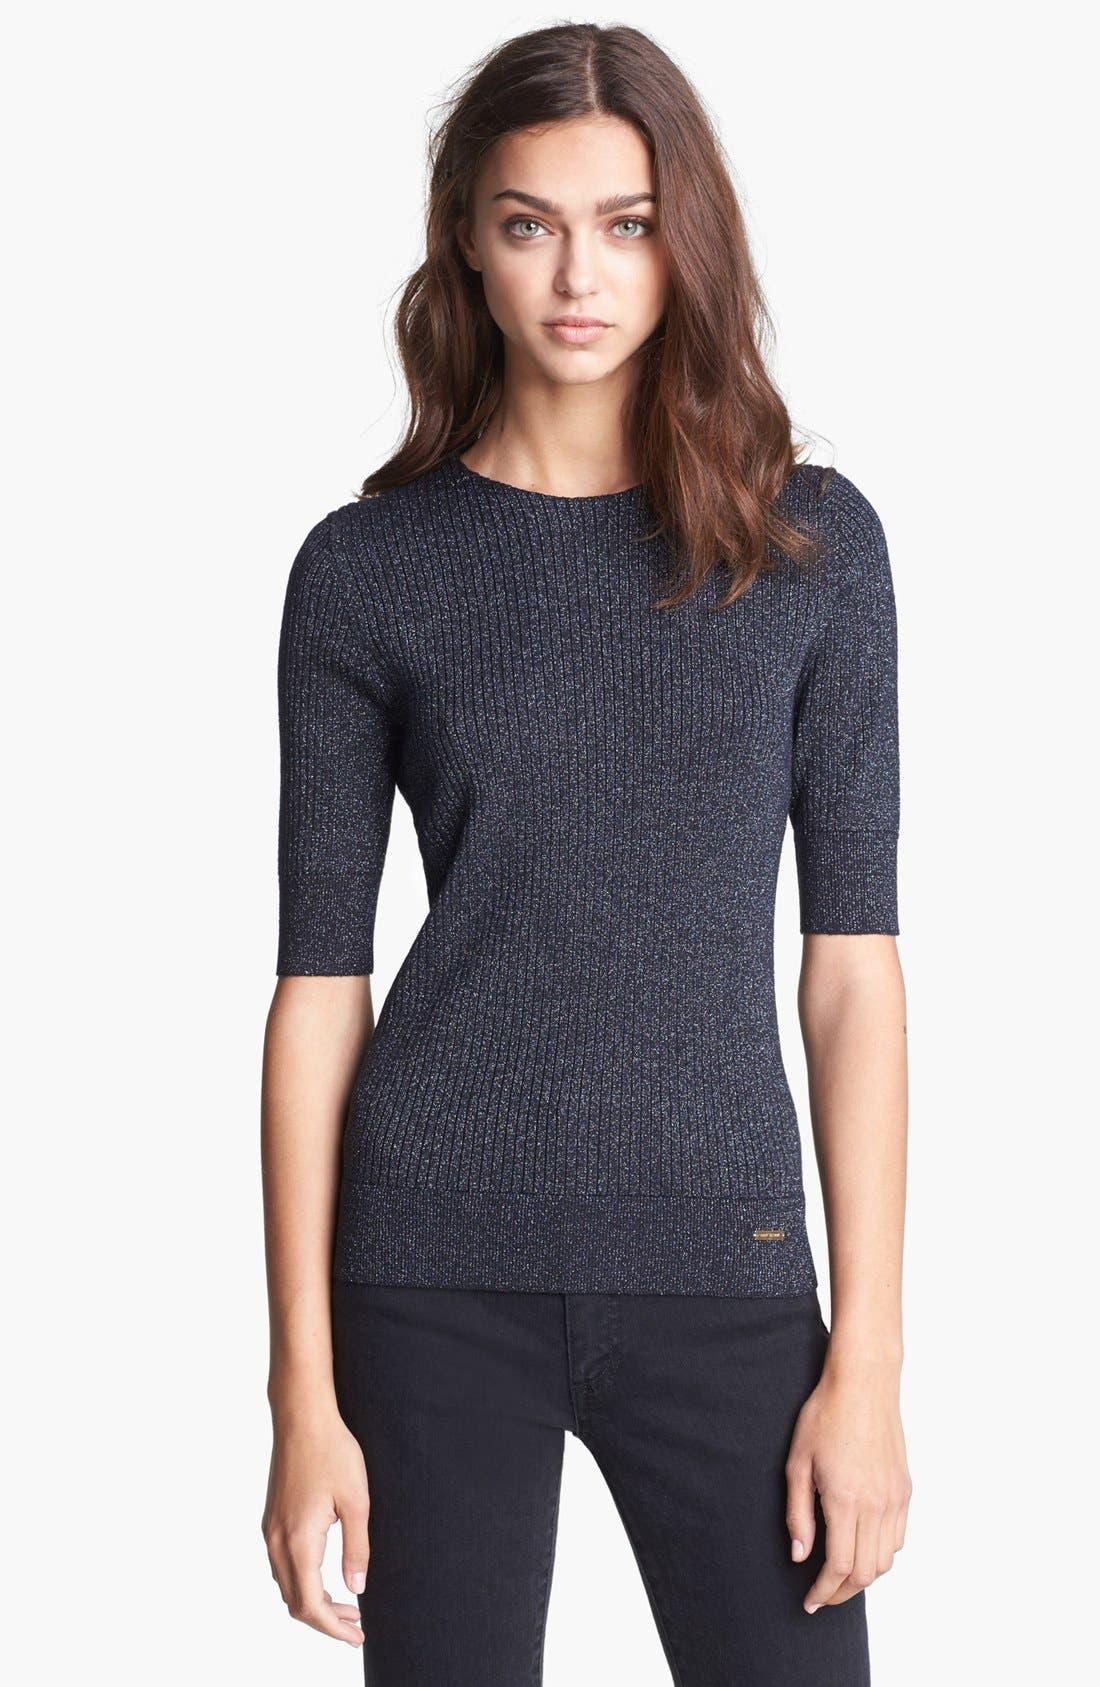 Alternate Image 1 Selected - Tory Burch 'Joella' Ribbed Sweater